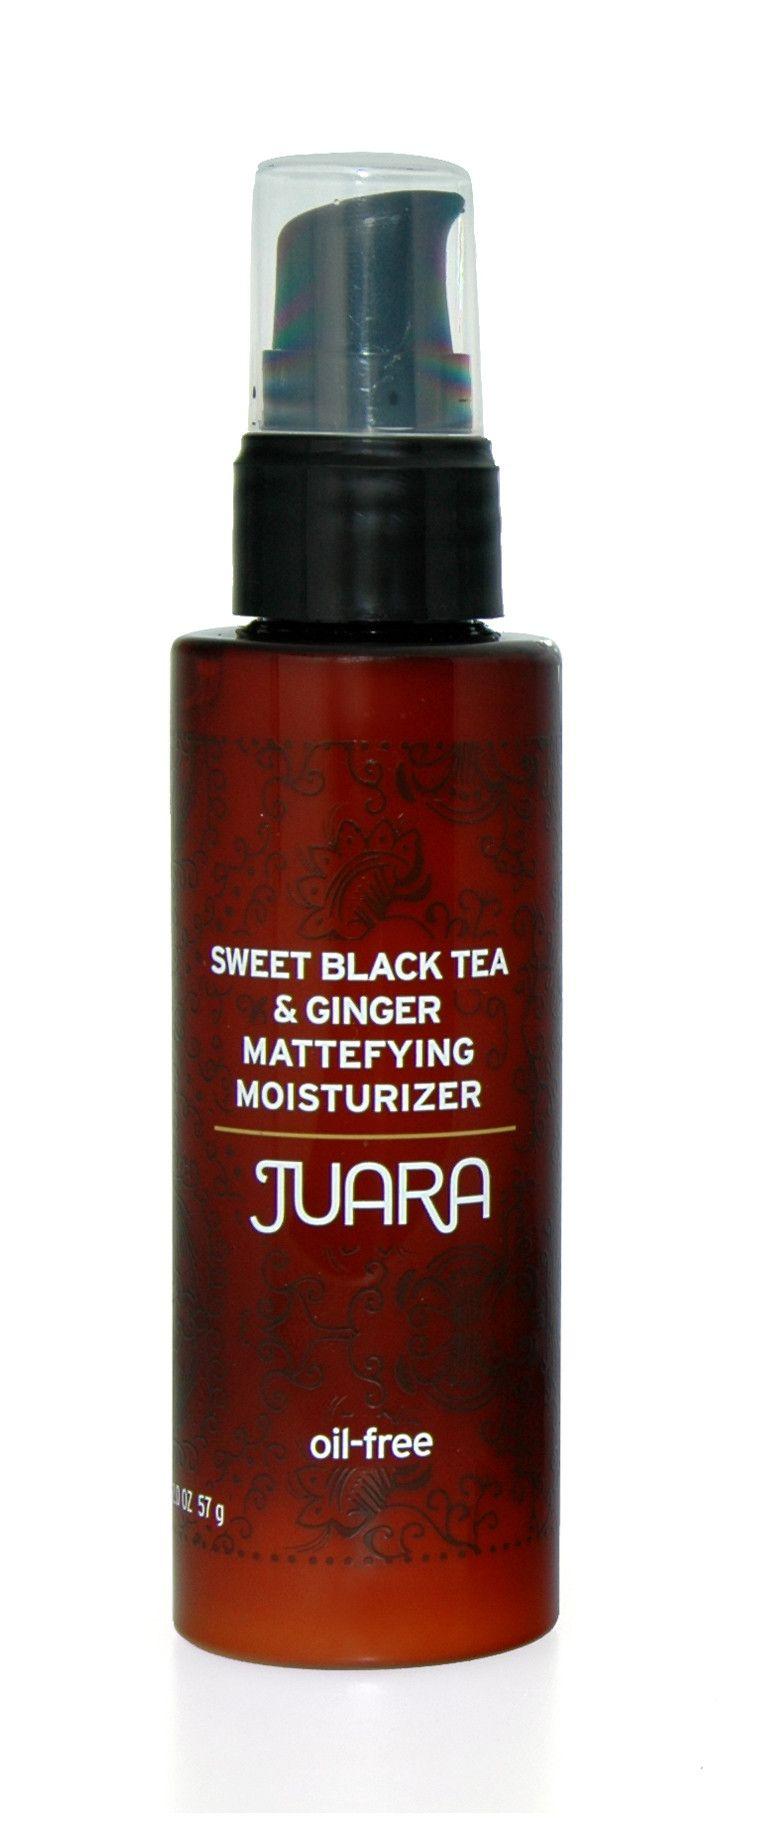 Sweet Black Tea & Ginger Mattifying Moisturizer (With